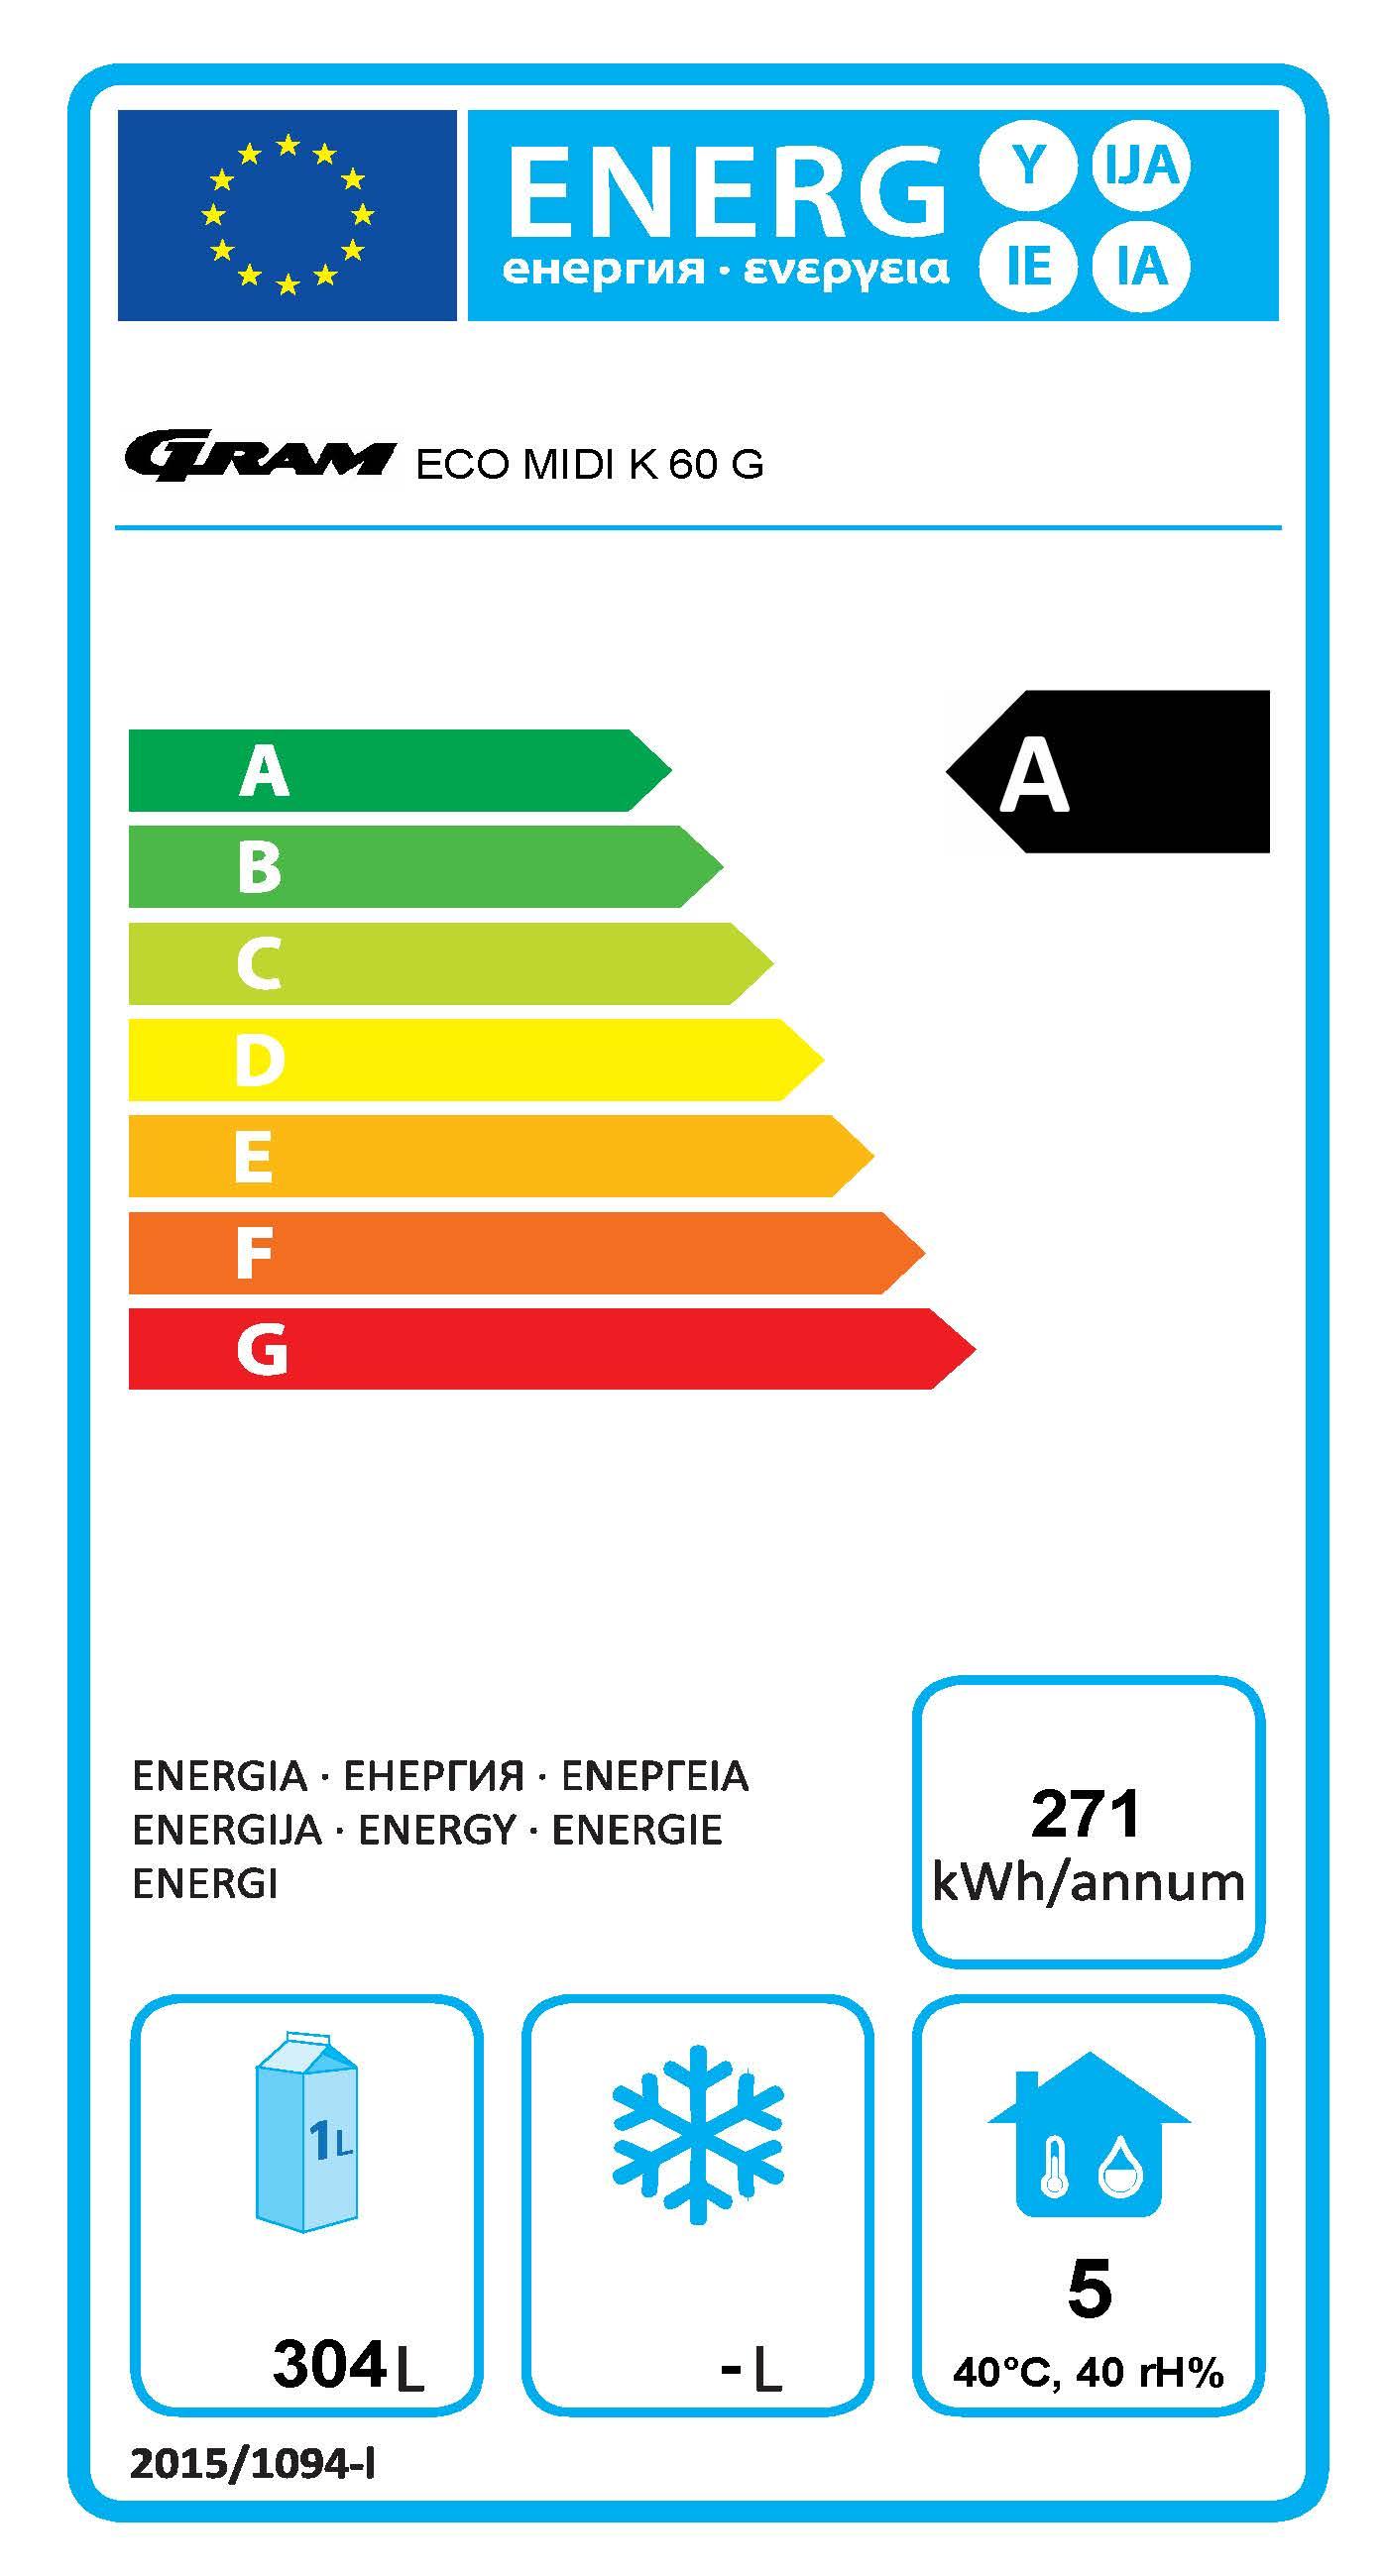 ECO MIDI K 60 LAG 4N 407 Ltr Upright Refrigerator Energy Rating